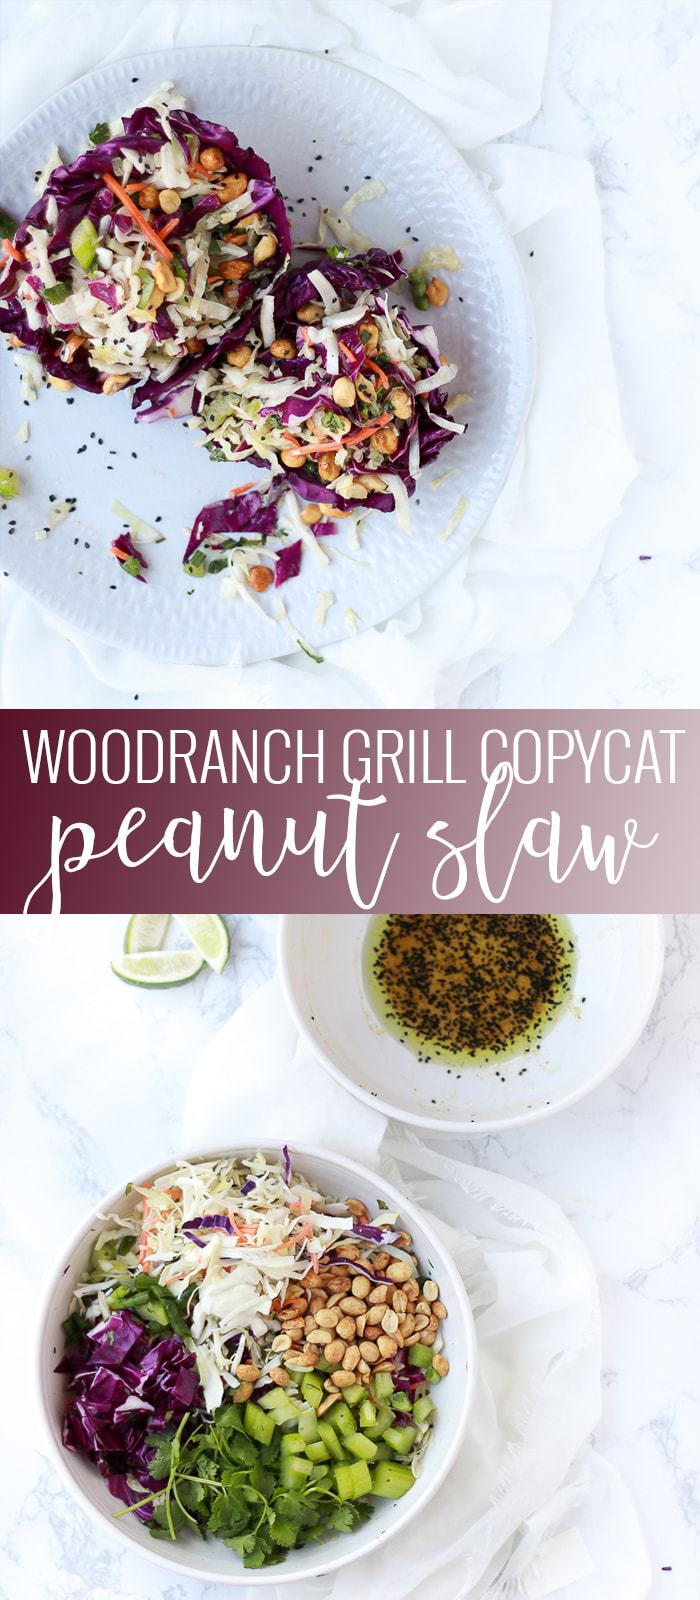 Copycat Peanut Slaw | peanut slaw recipe | homemade coleslaw recipe | easy slaw recipes | WoodRanch Grill peanut slaw recipe | asian peanut slaw || Oh So Delicioso #peanutslaw #asianslaw #copycatrecipe